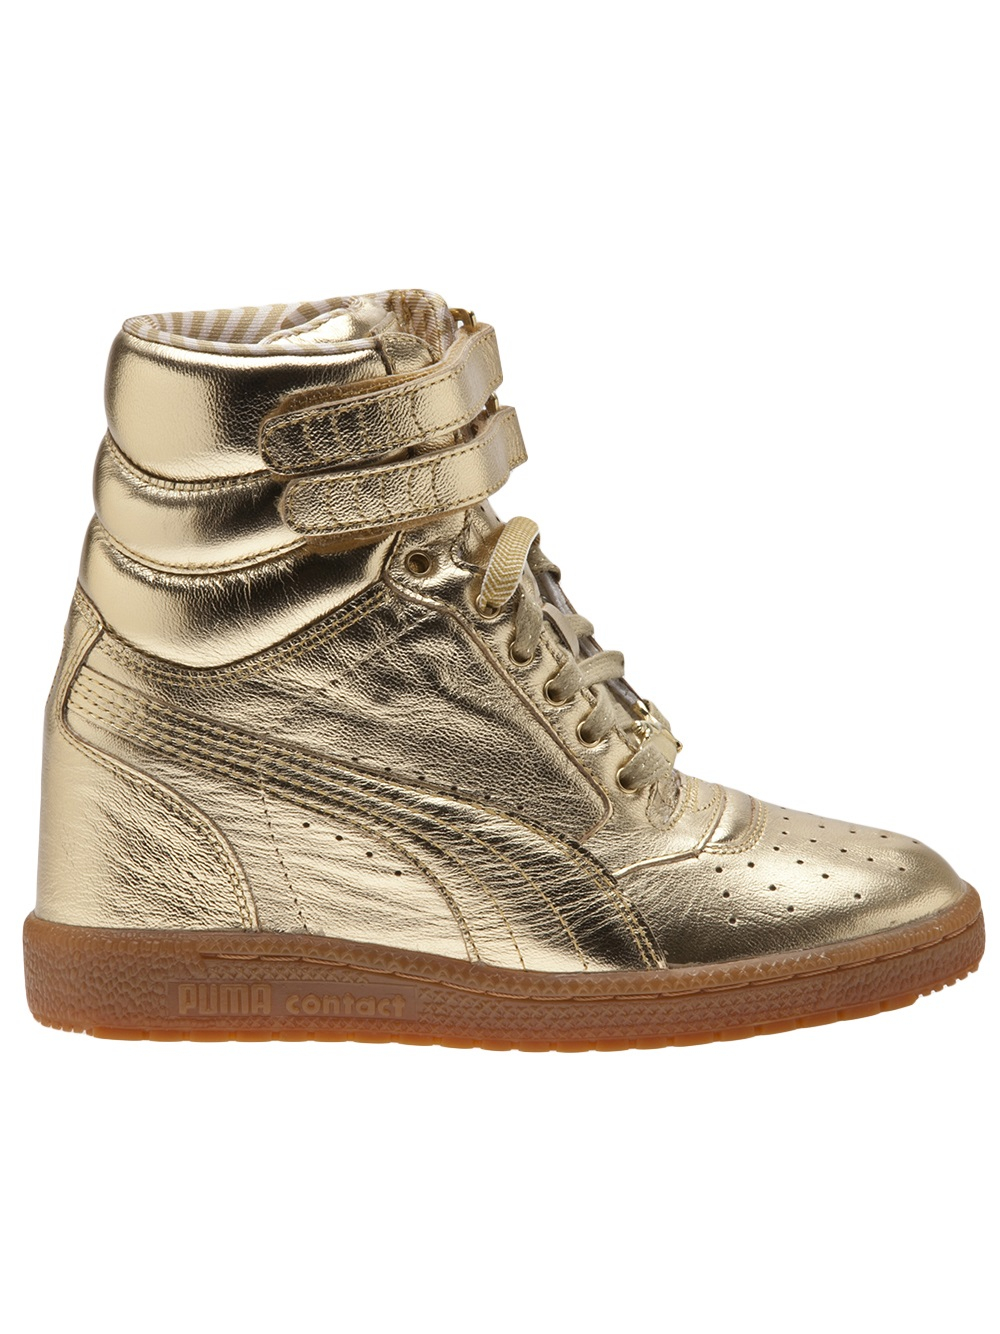 Lyst - PUMA Sky Wedge Sneaker in Metallic